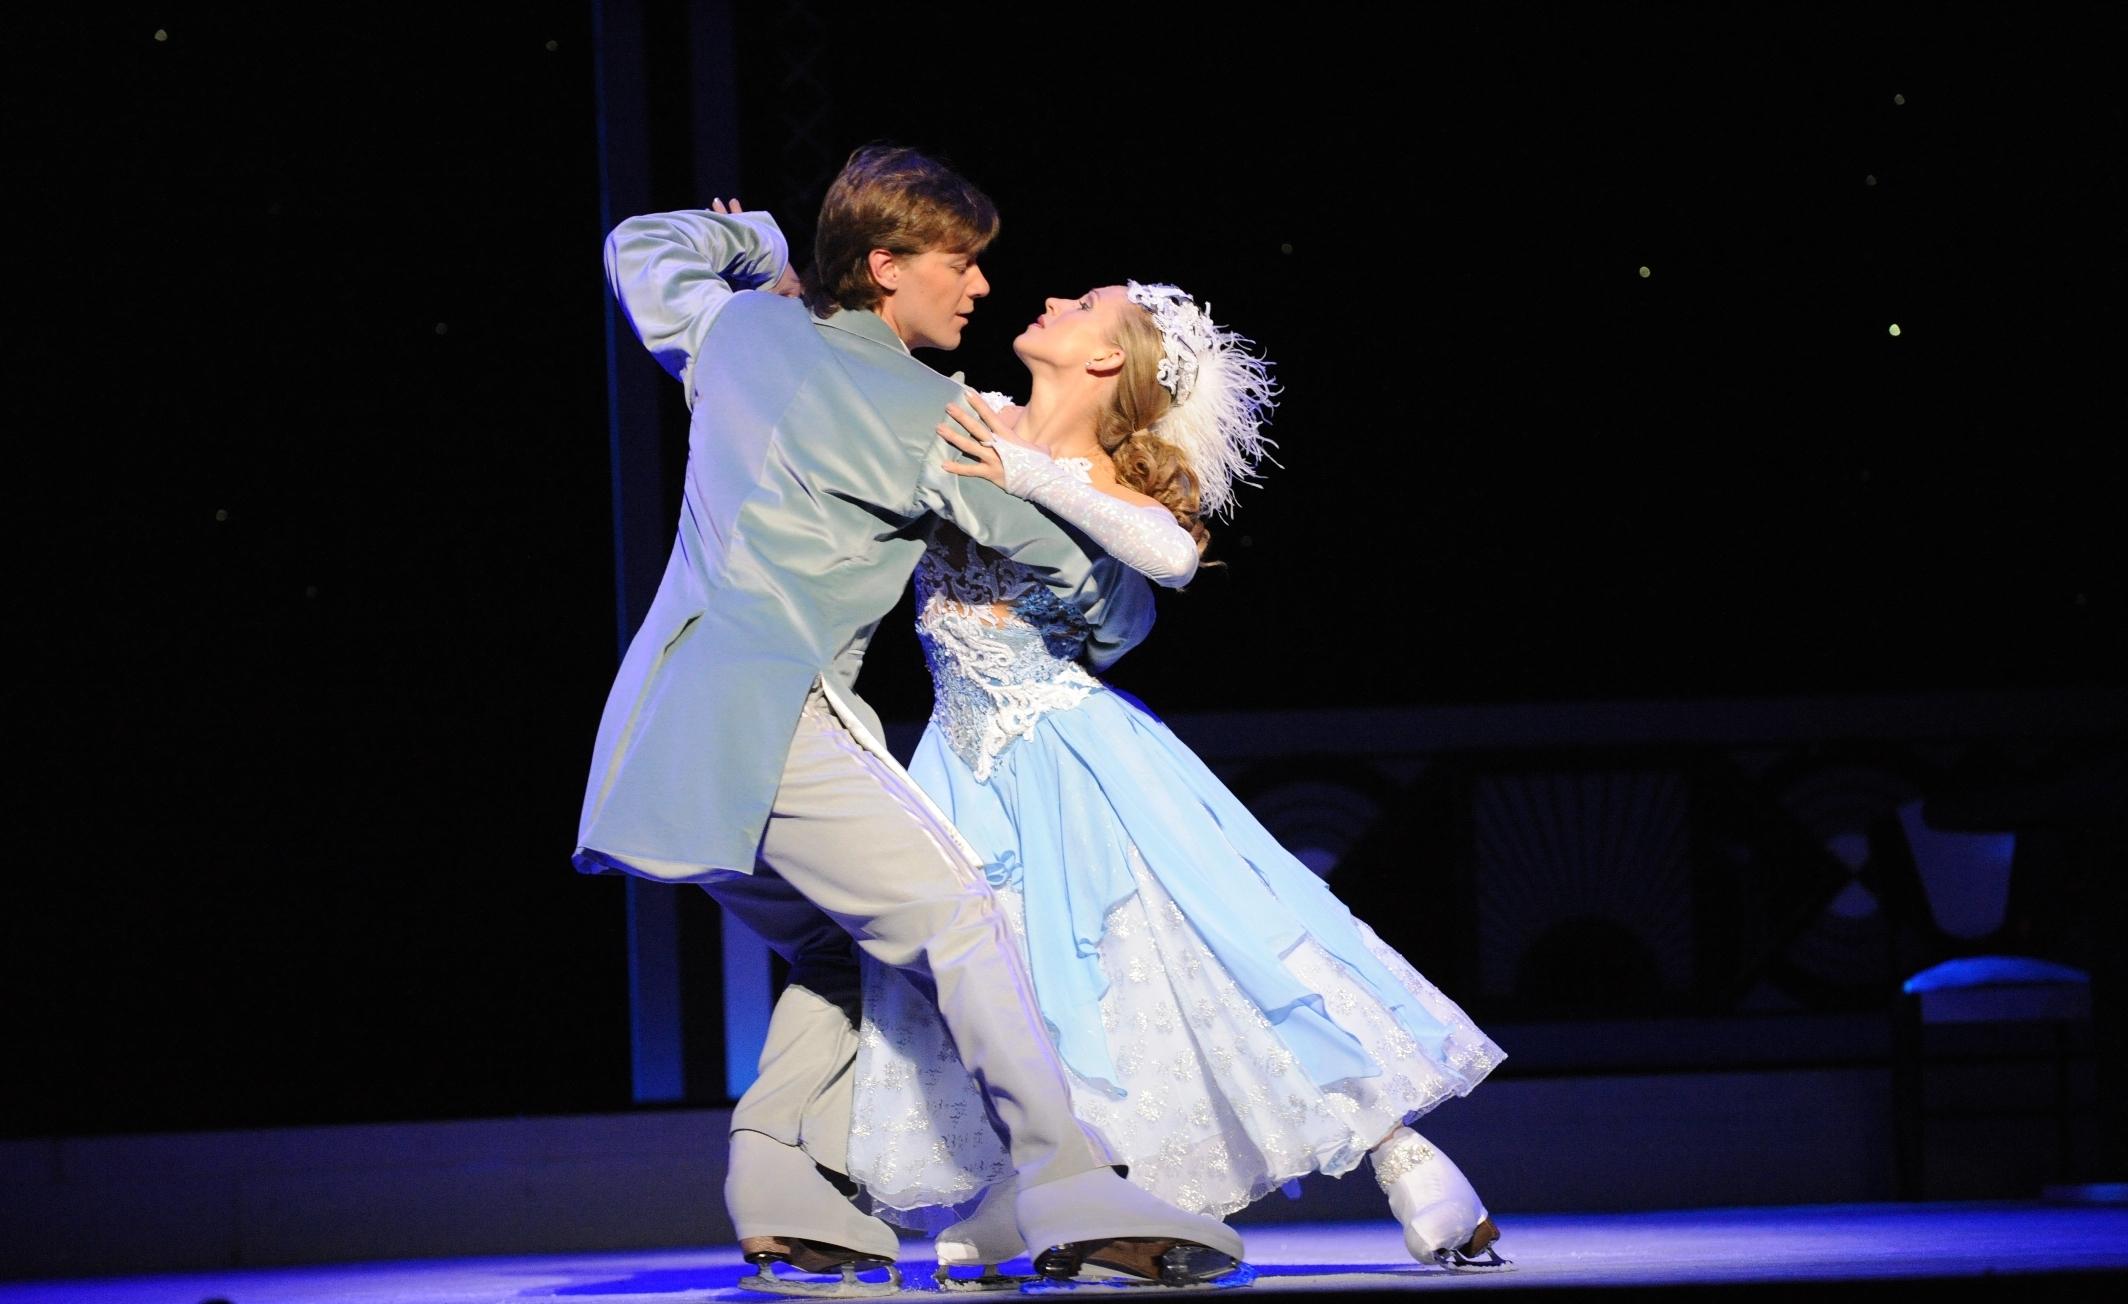 Cinderella on Ice - Couple